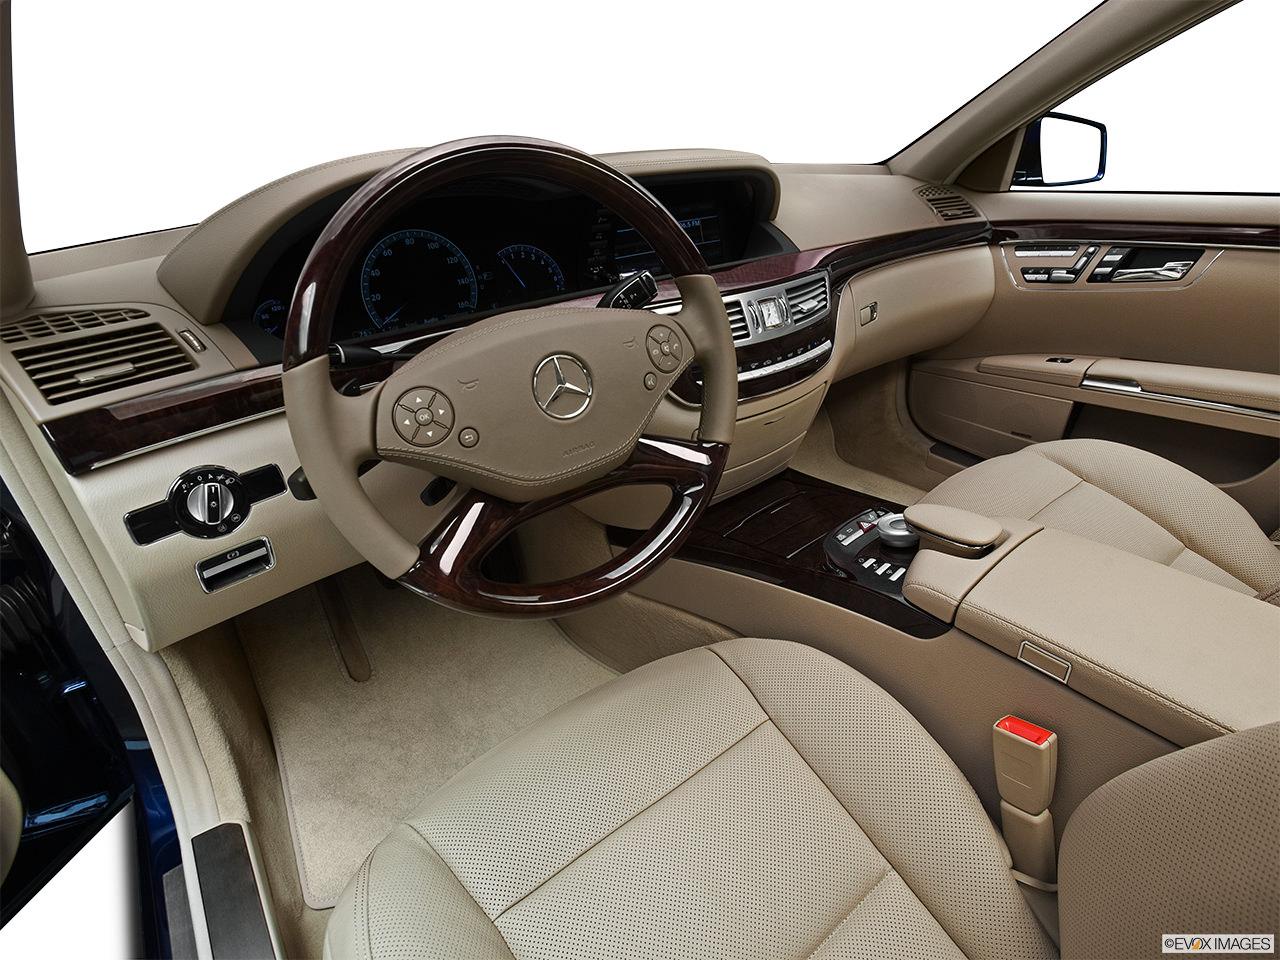 Mercedes Benz S-Class 2012 Interior